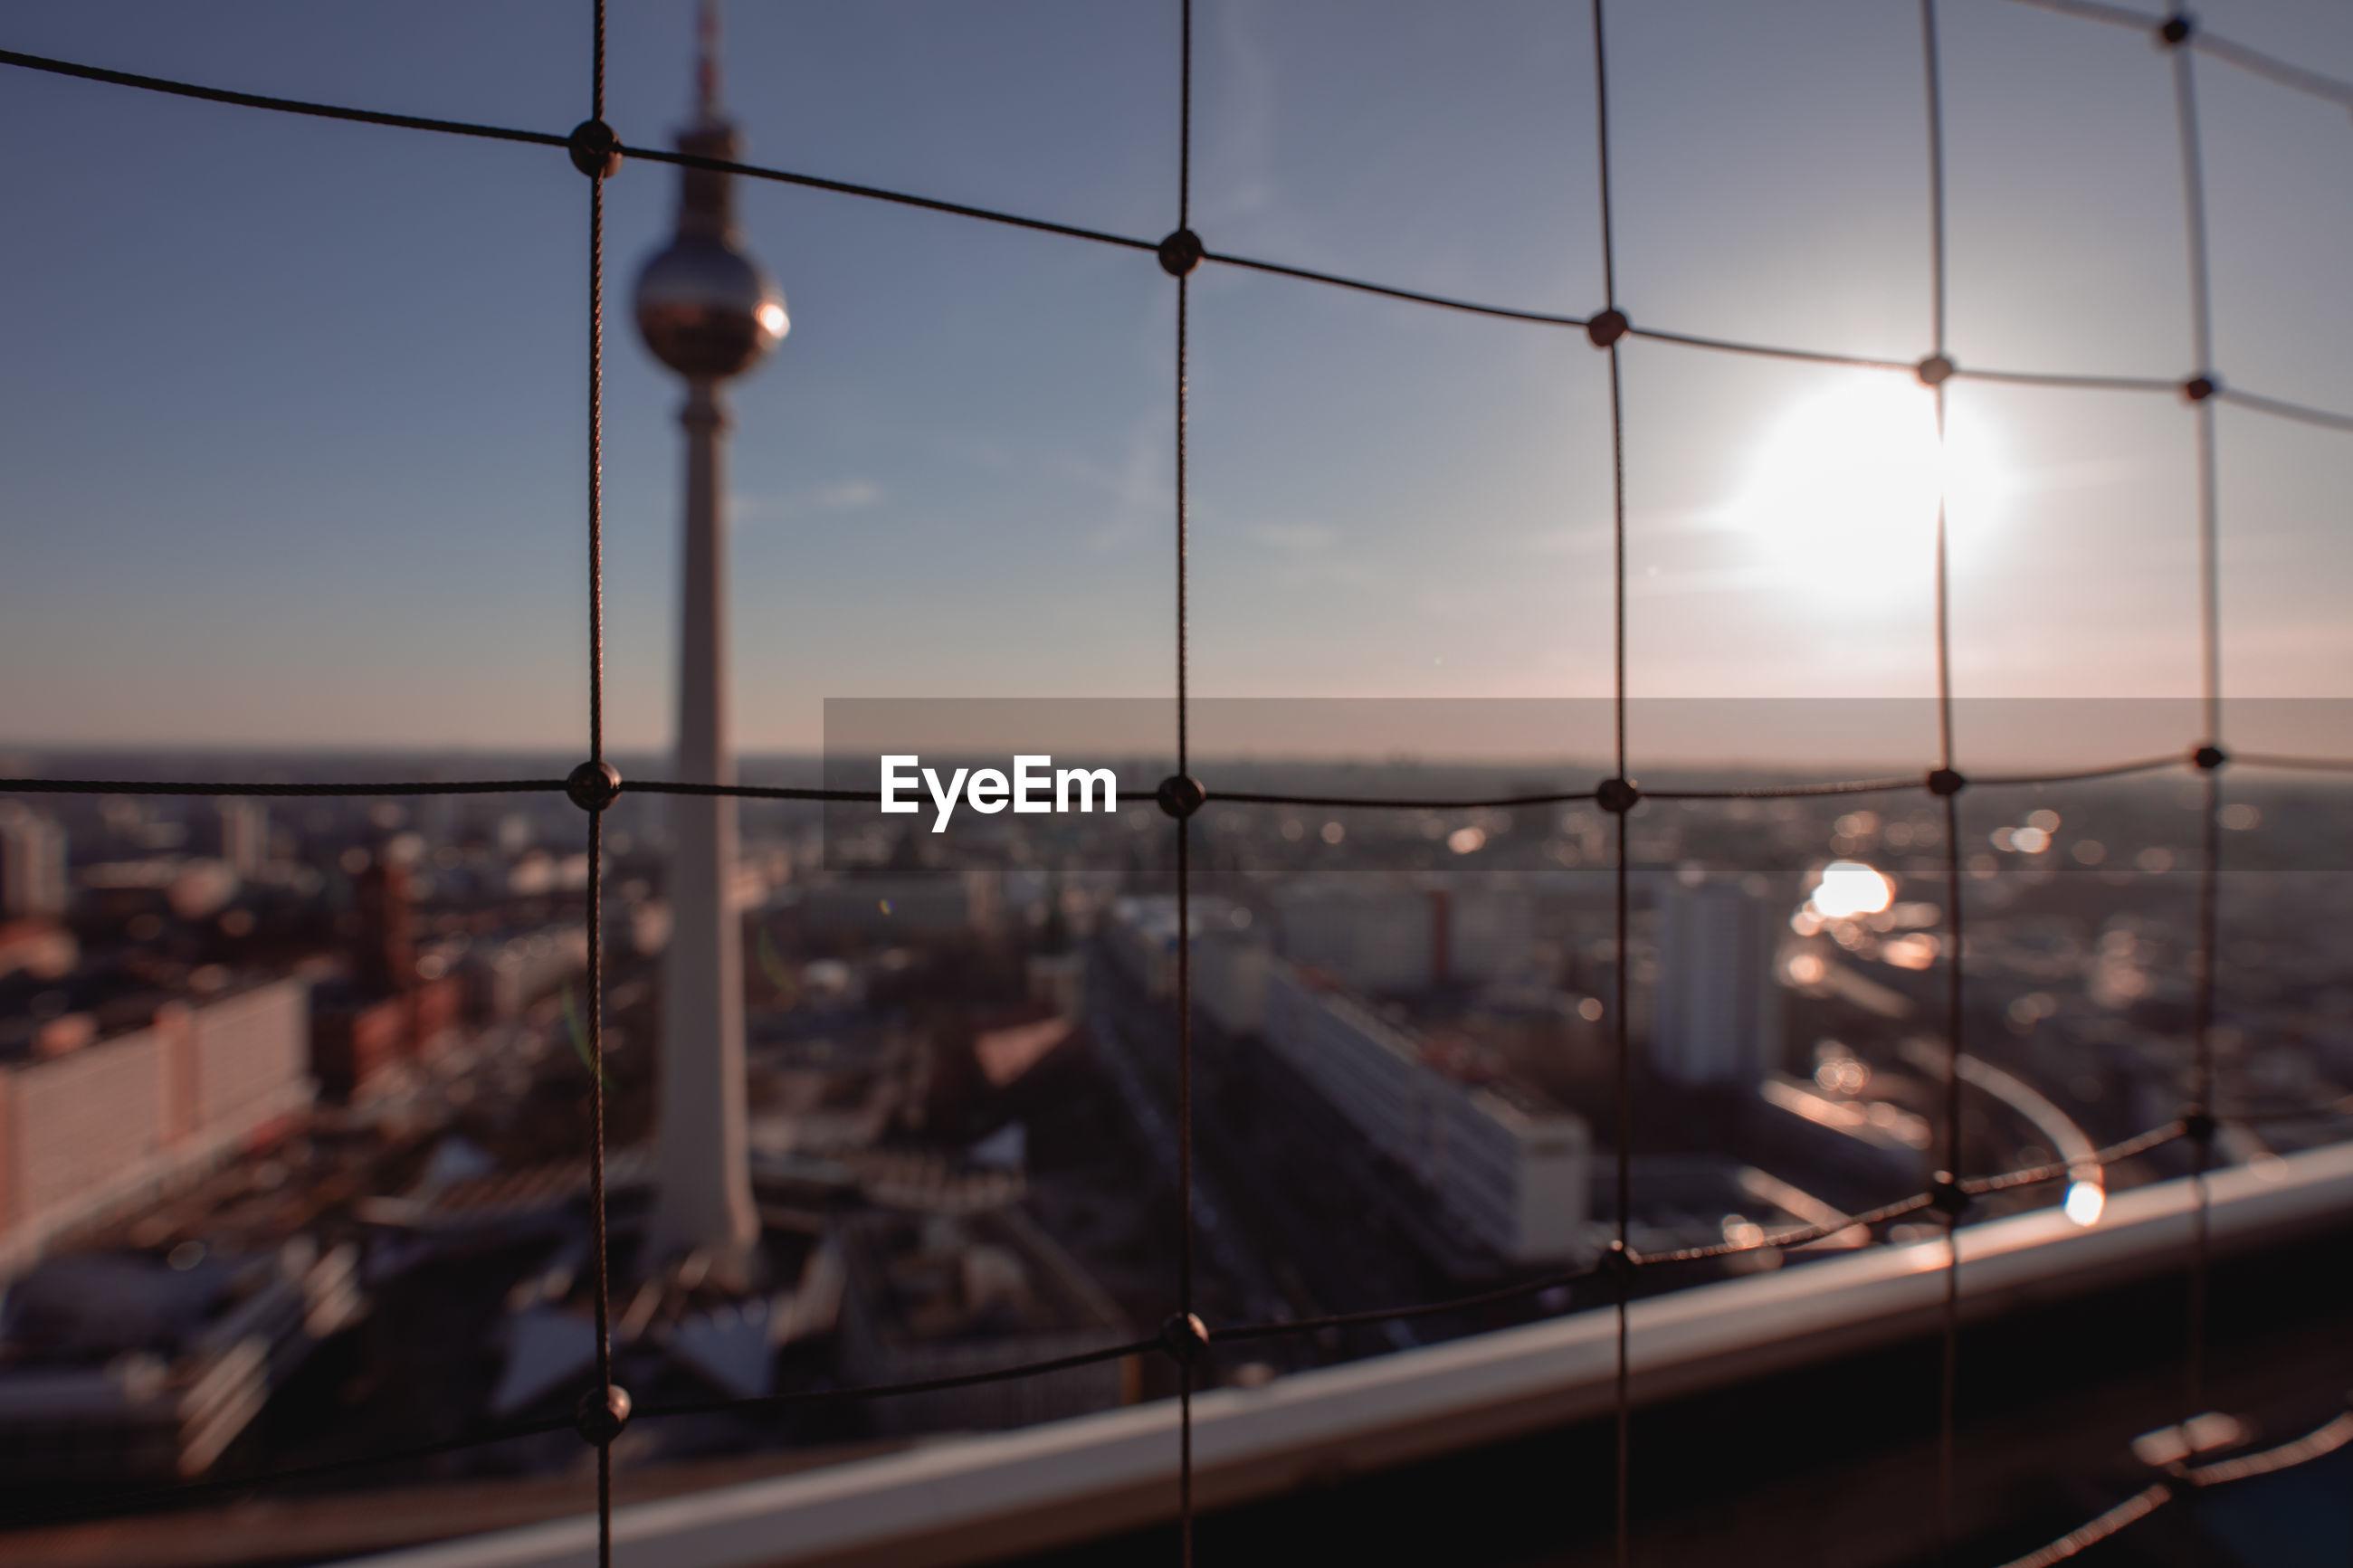 SCENIC VIEW OF SUNSET THROUGH WINDOW